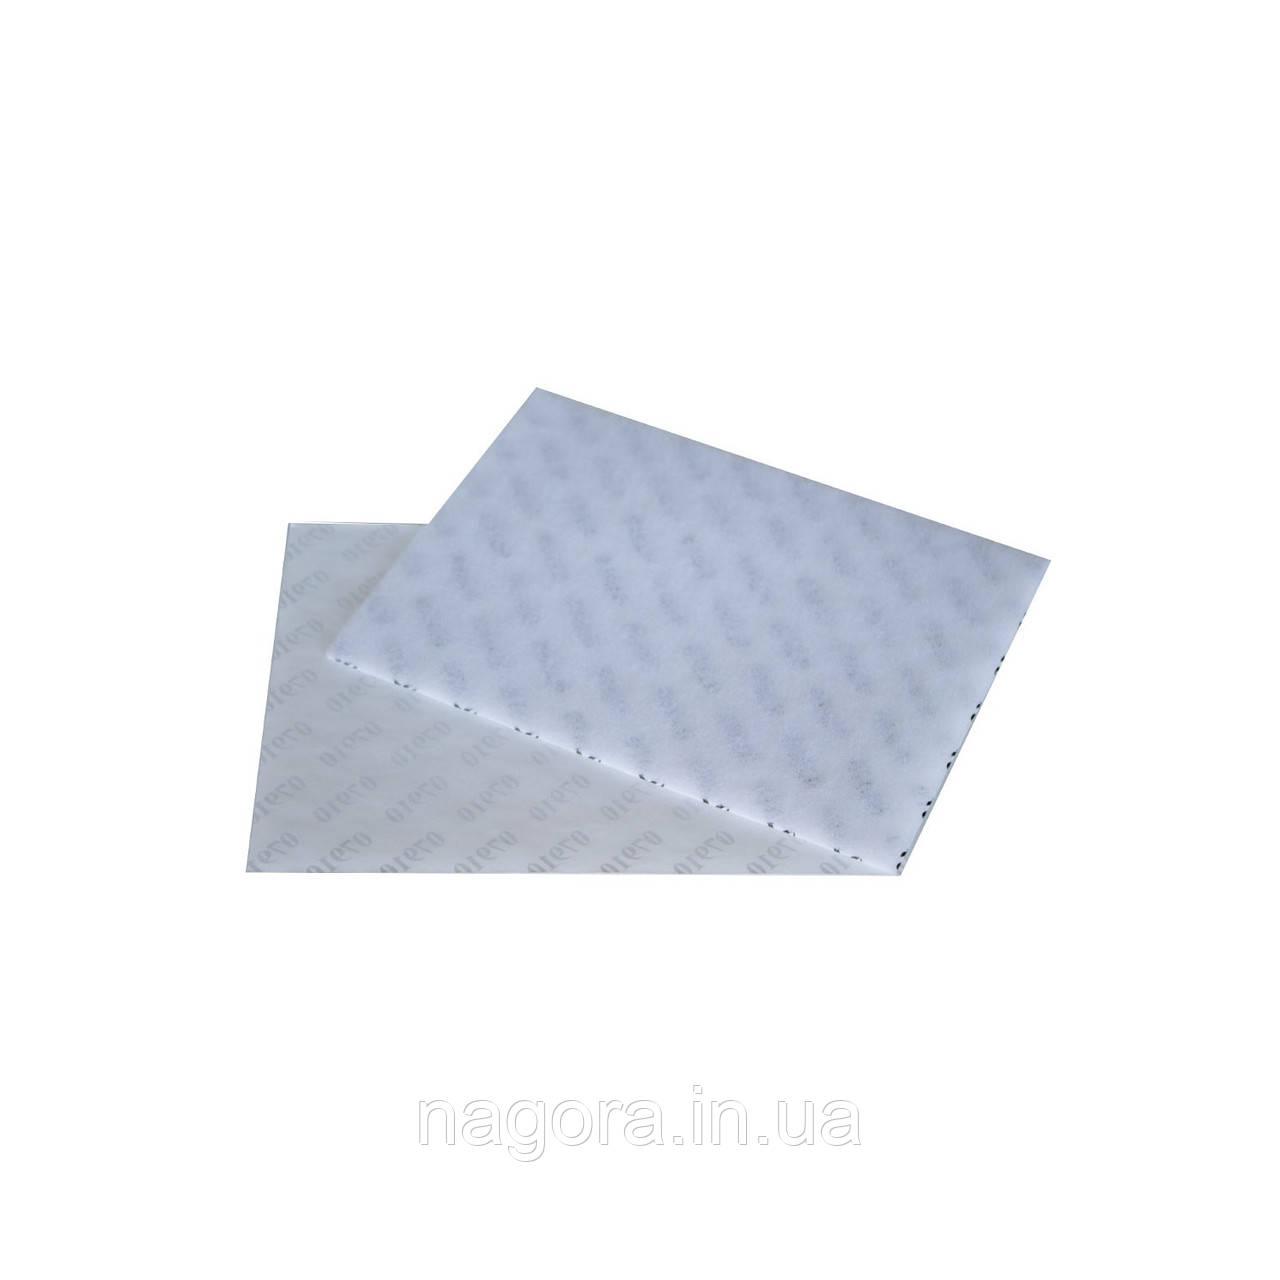 Протирочная липкая салфетка 3M Tack Pad 175*235 мм